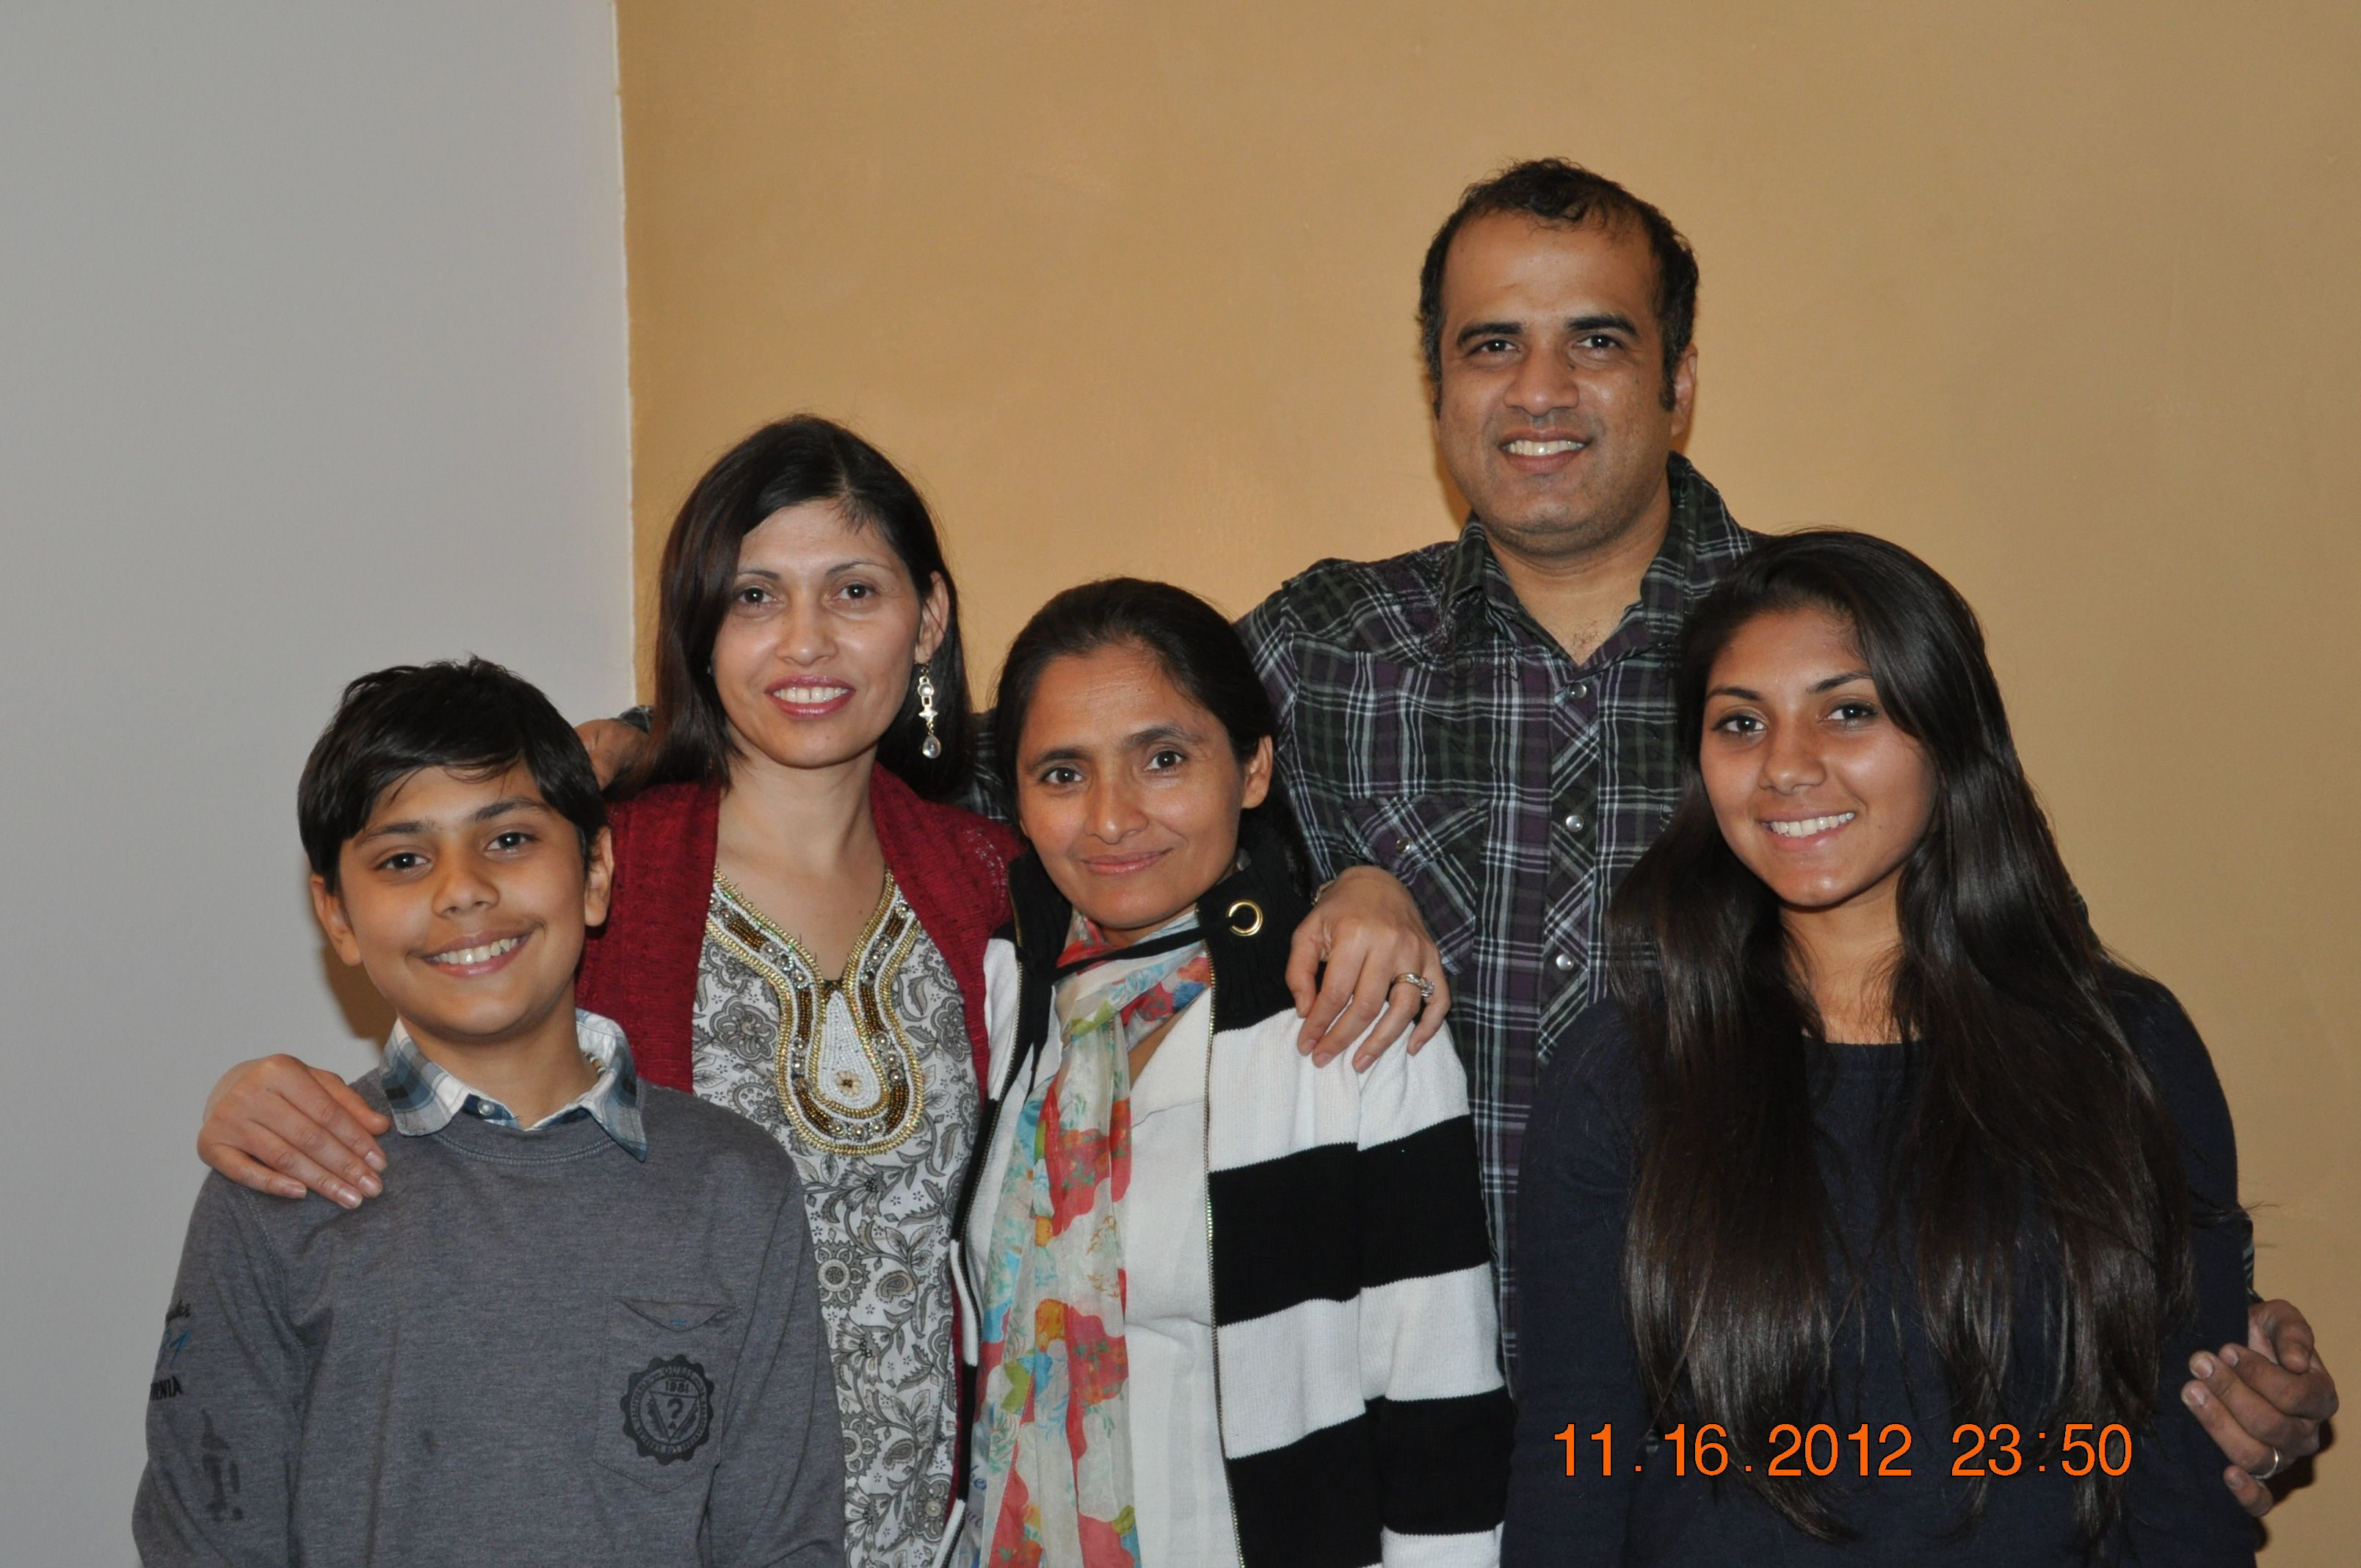 2013-08-20-radhaandfamily.jpg